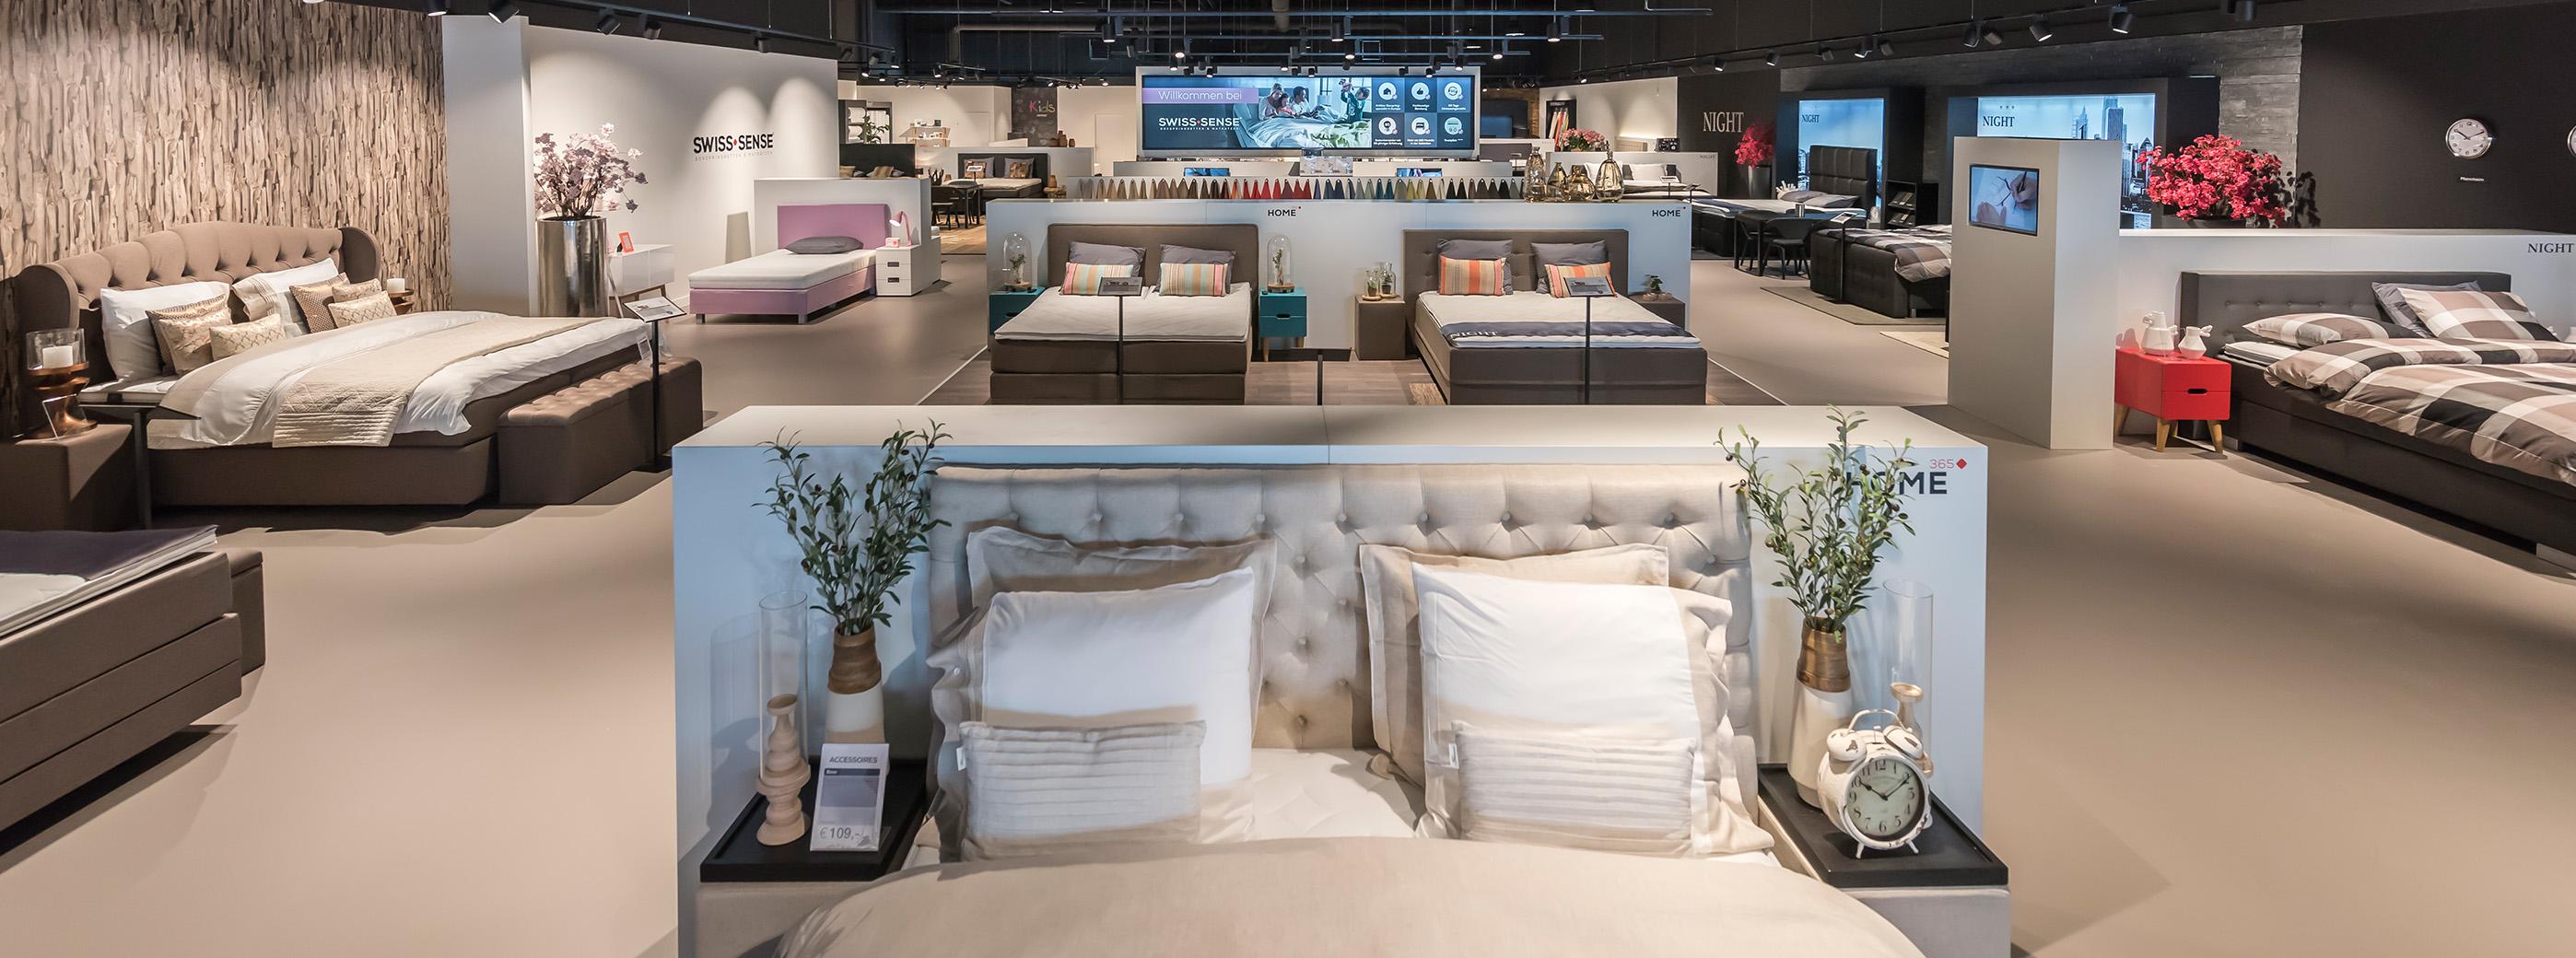 boxspringbetten und matratzen in w rselen swiss sense. Black Bedroom Furniture Sets. Home Design Ideas